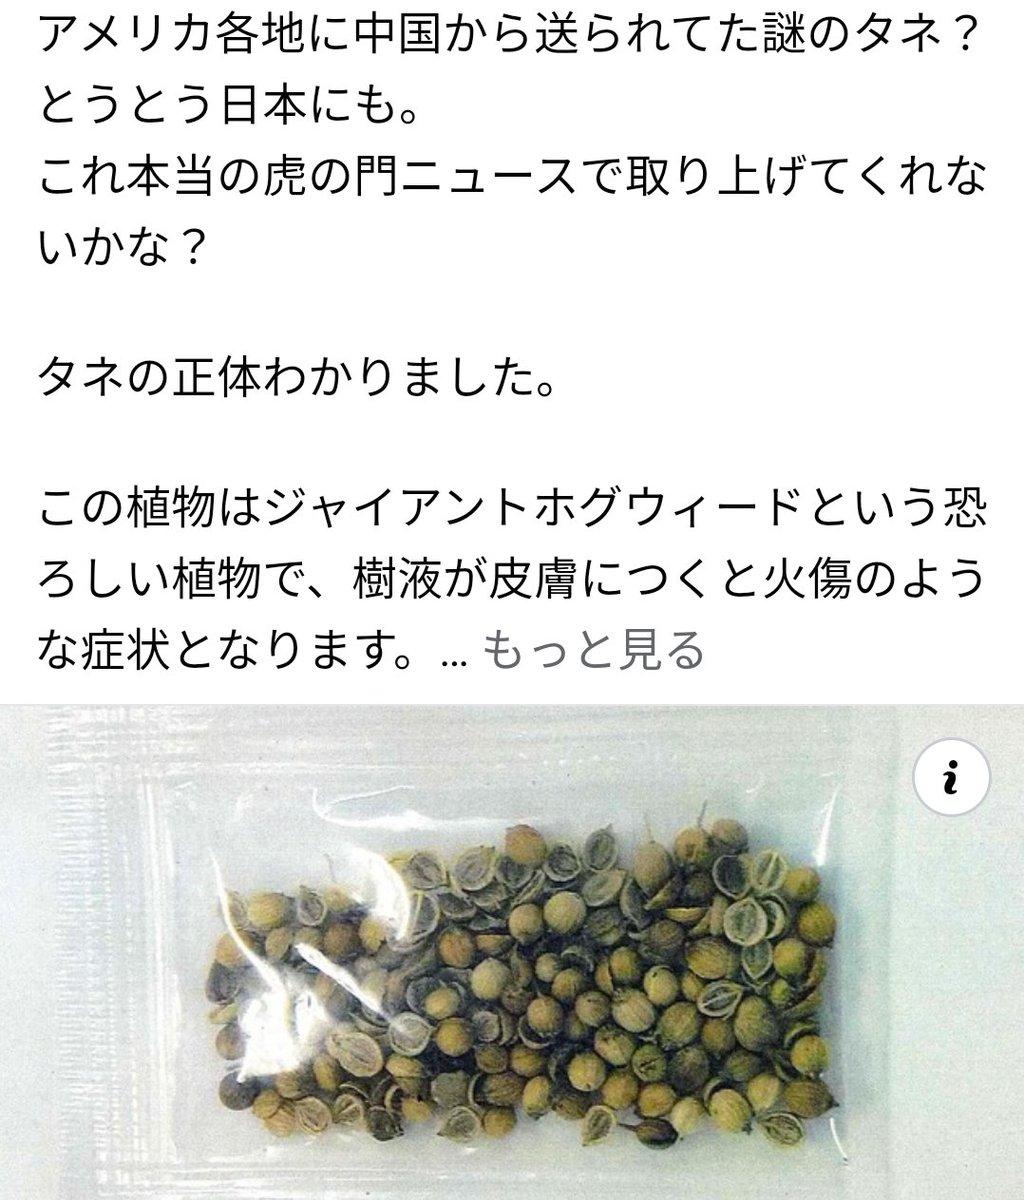 @media_otb 和田さん。中国から送りつけられる種の正体が、判明したらしいですよ。 https://t.co/USK9yvrQrc